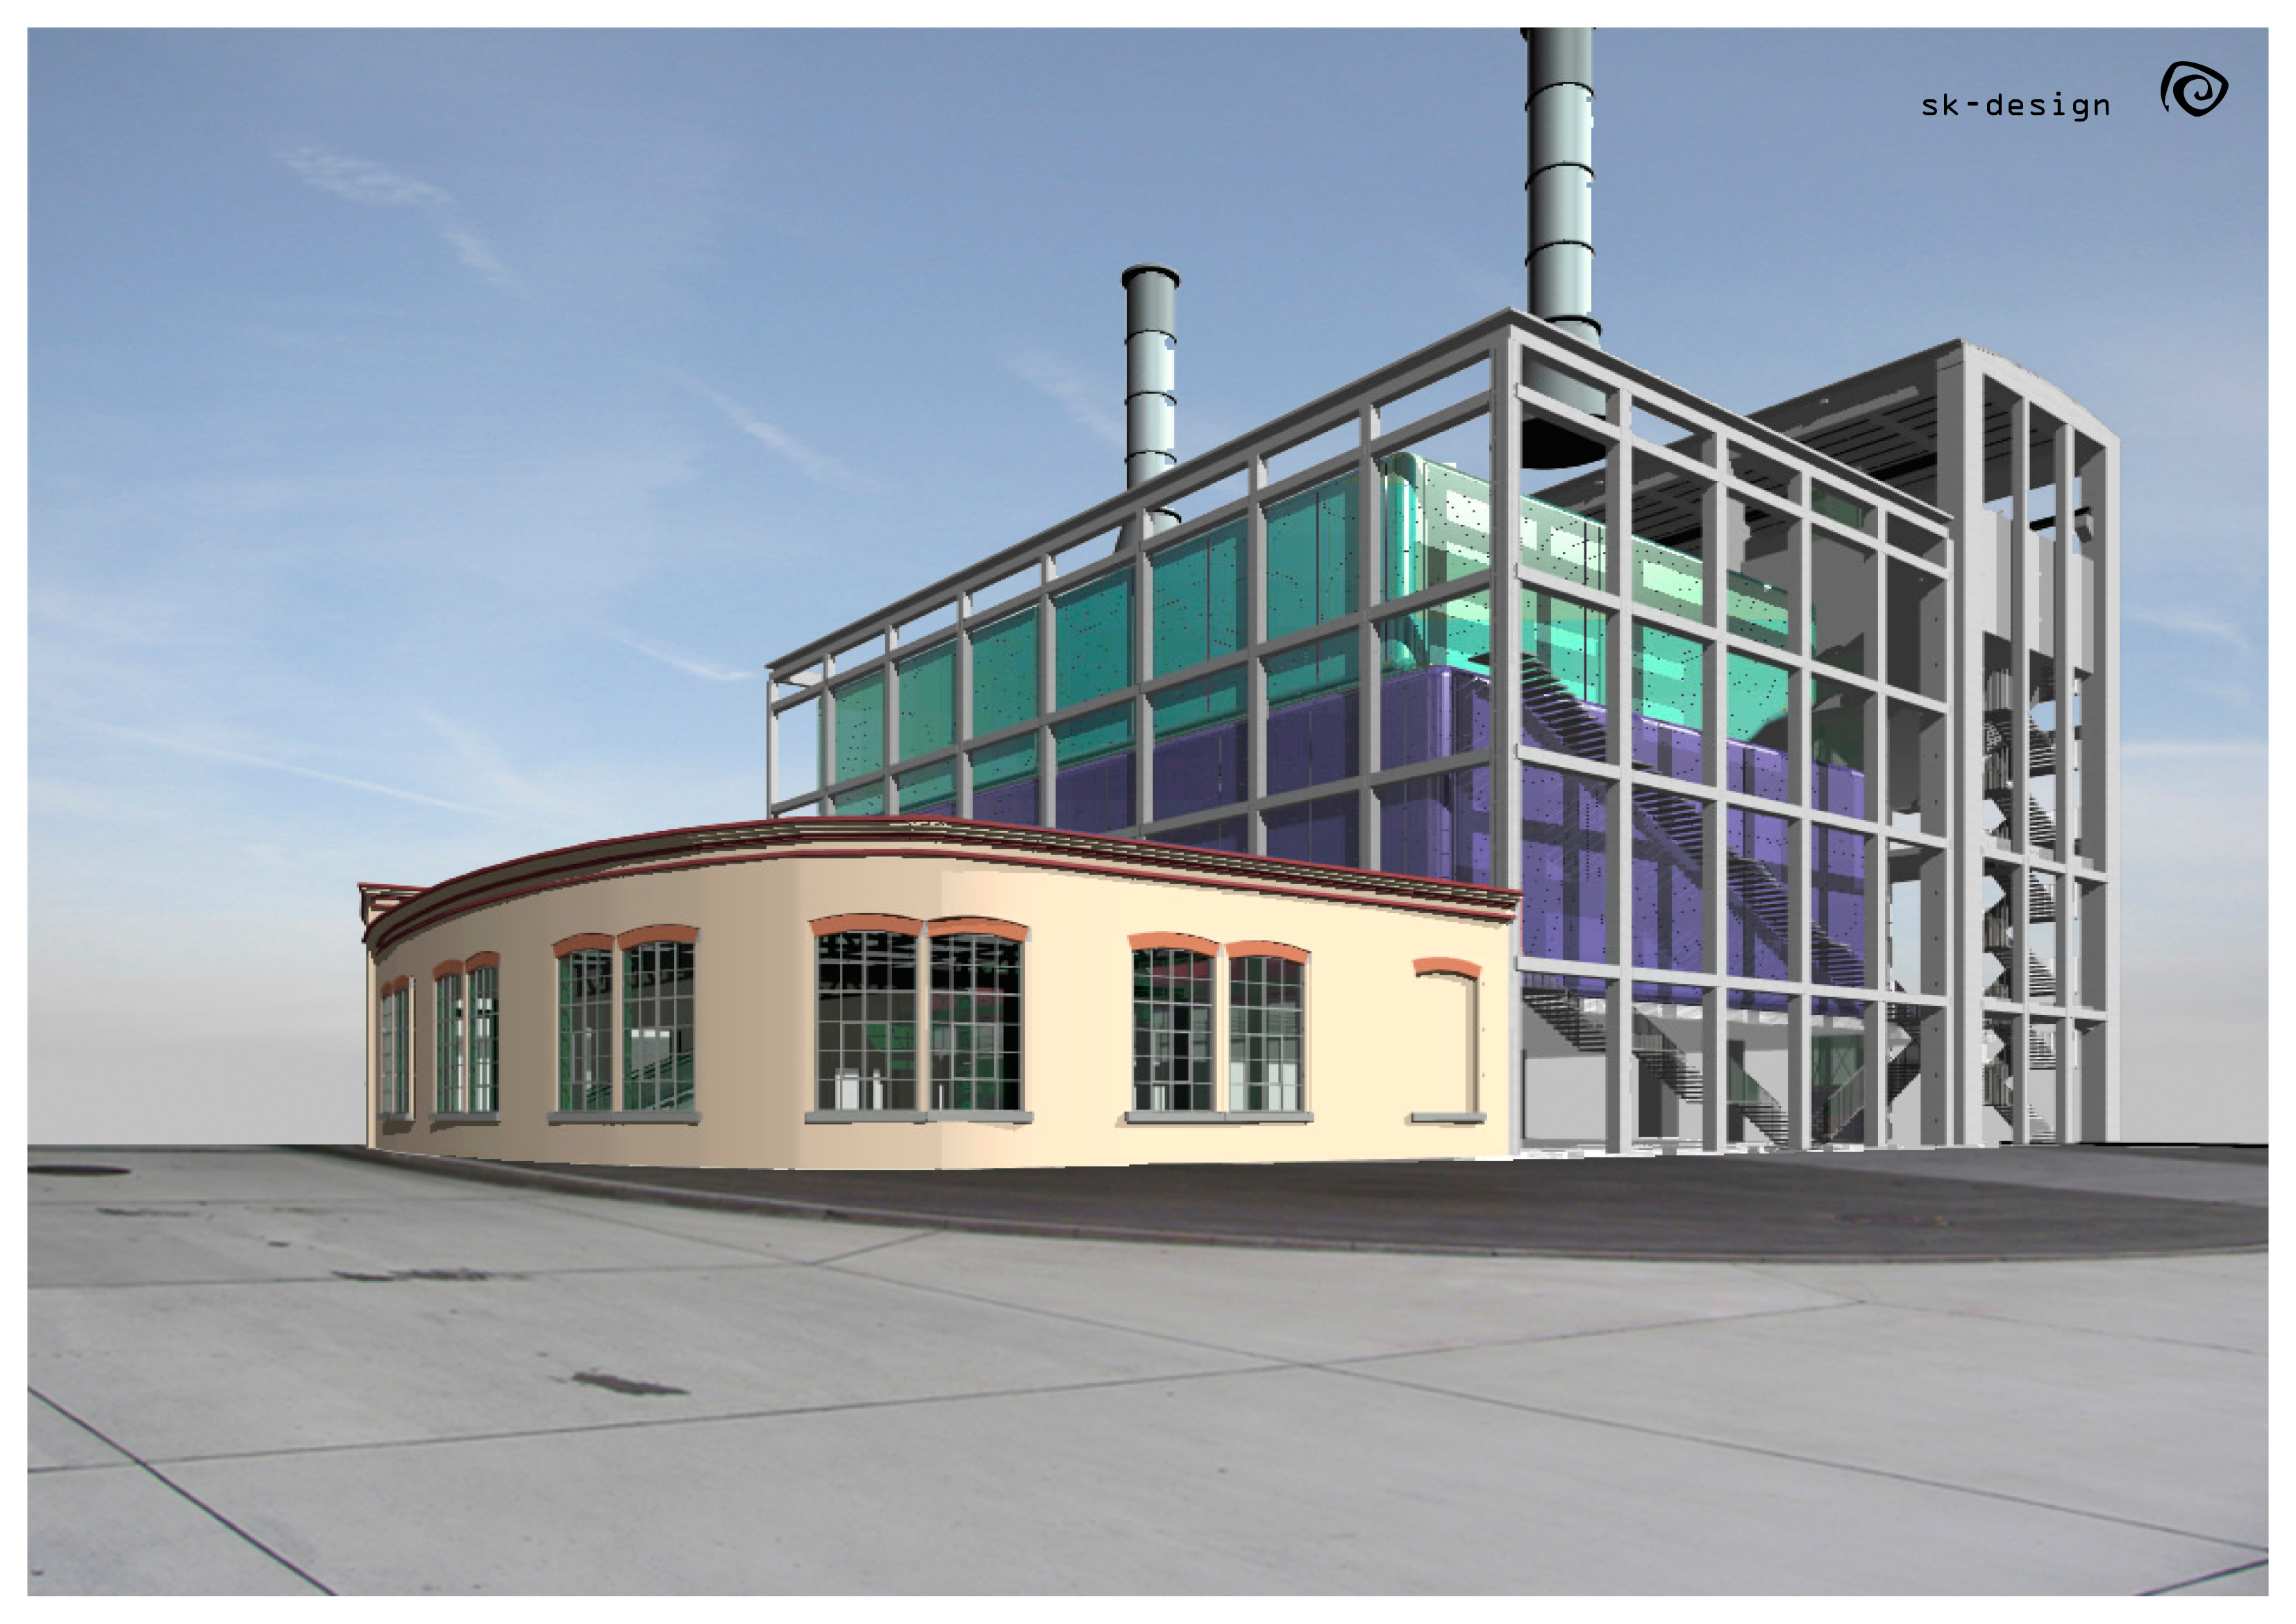 1409-Kesselhaus11.jpg